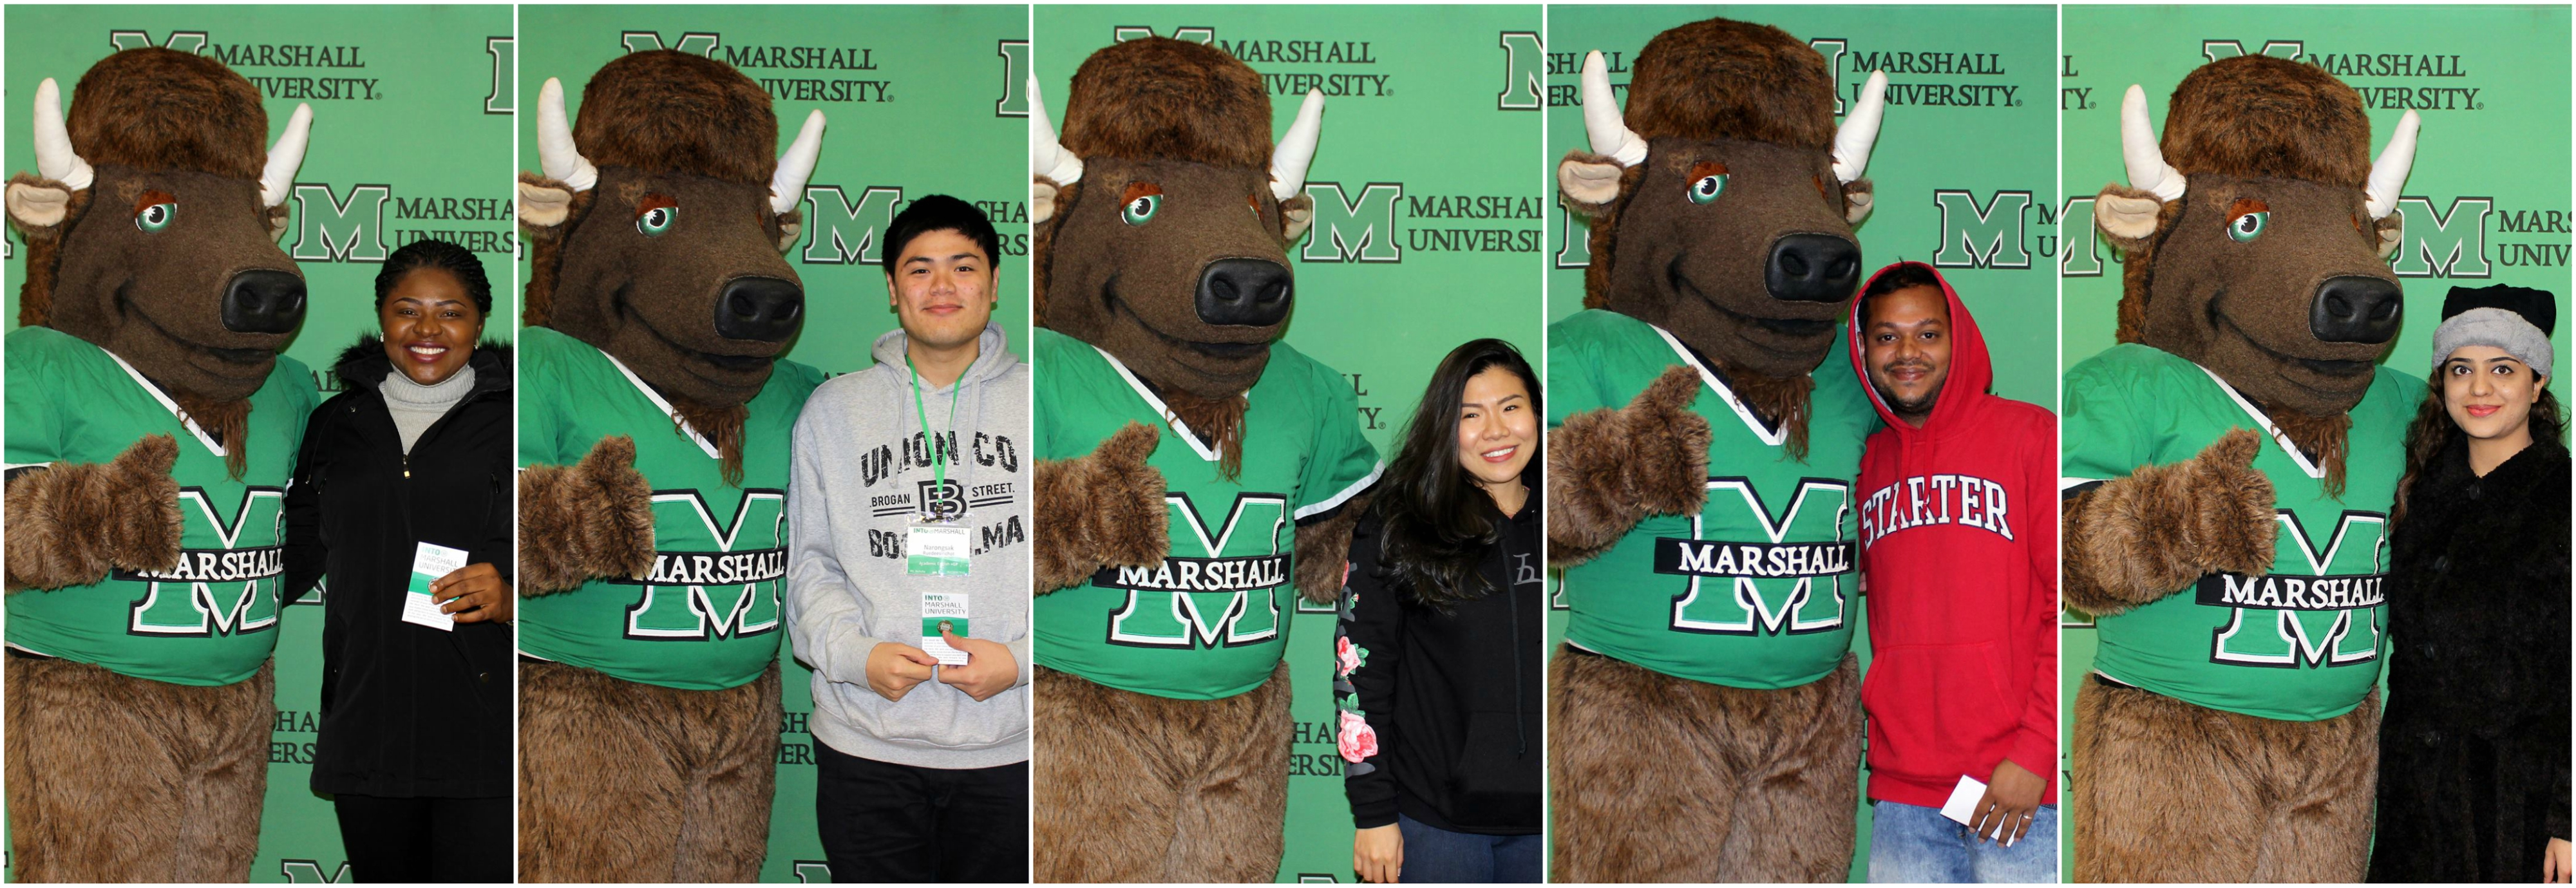 Meeting Marco, INTO Marshall University mascot